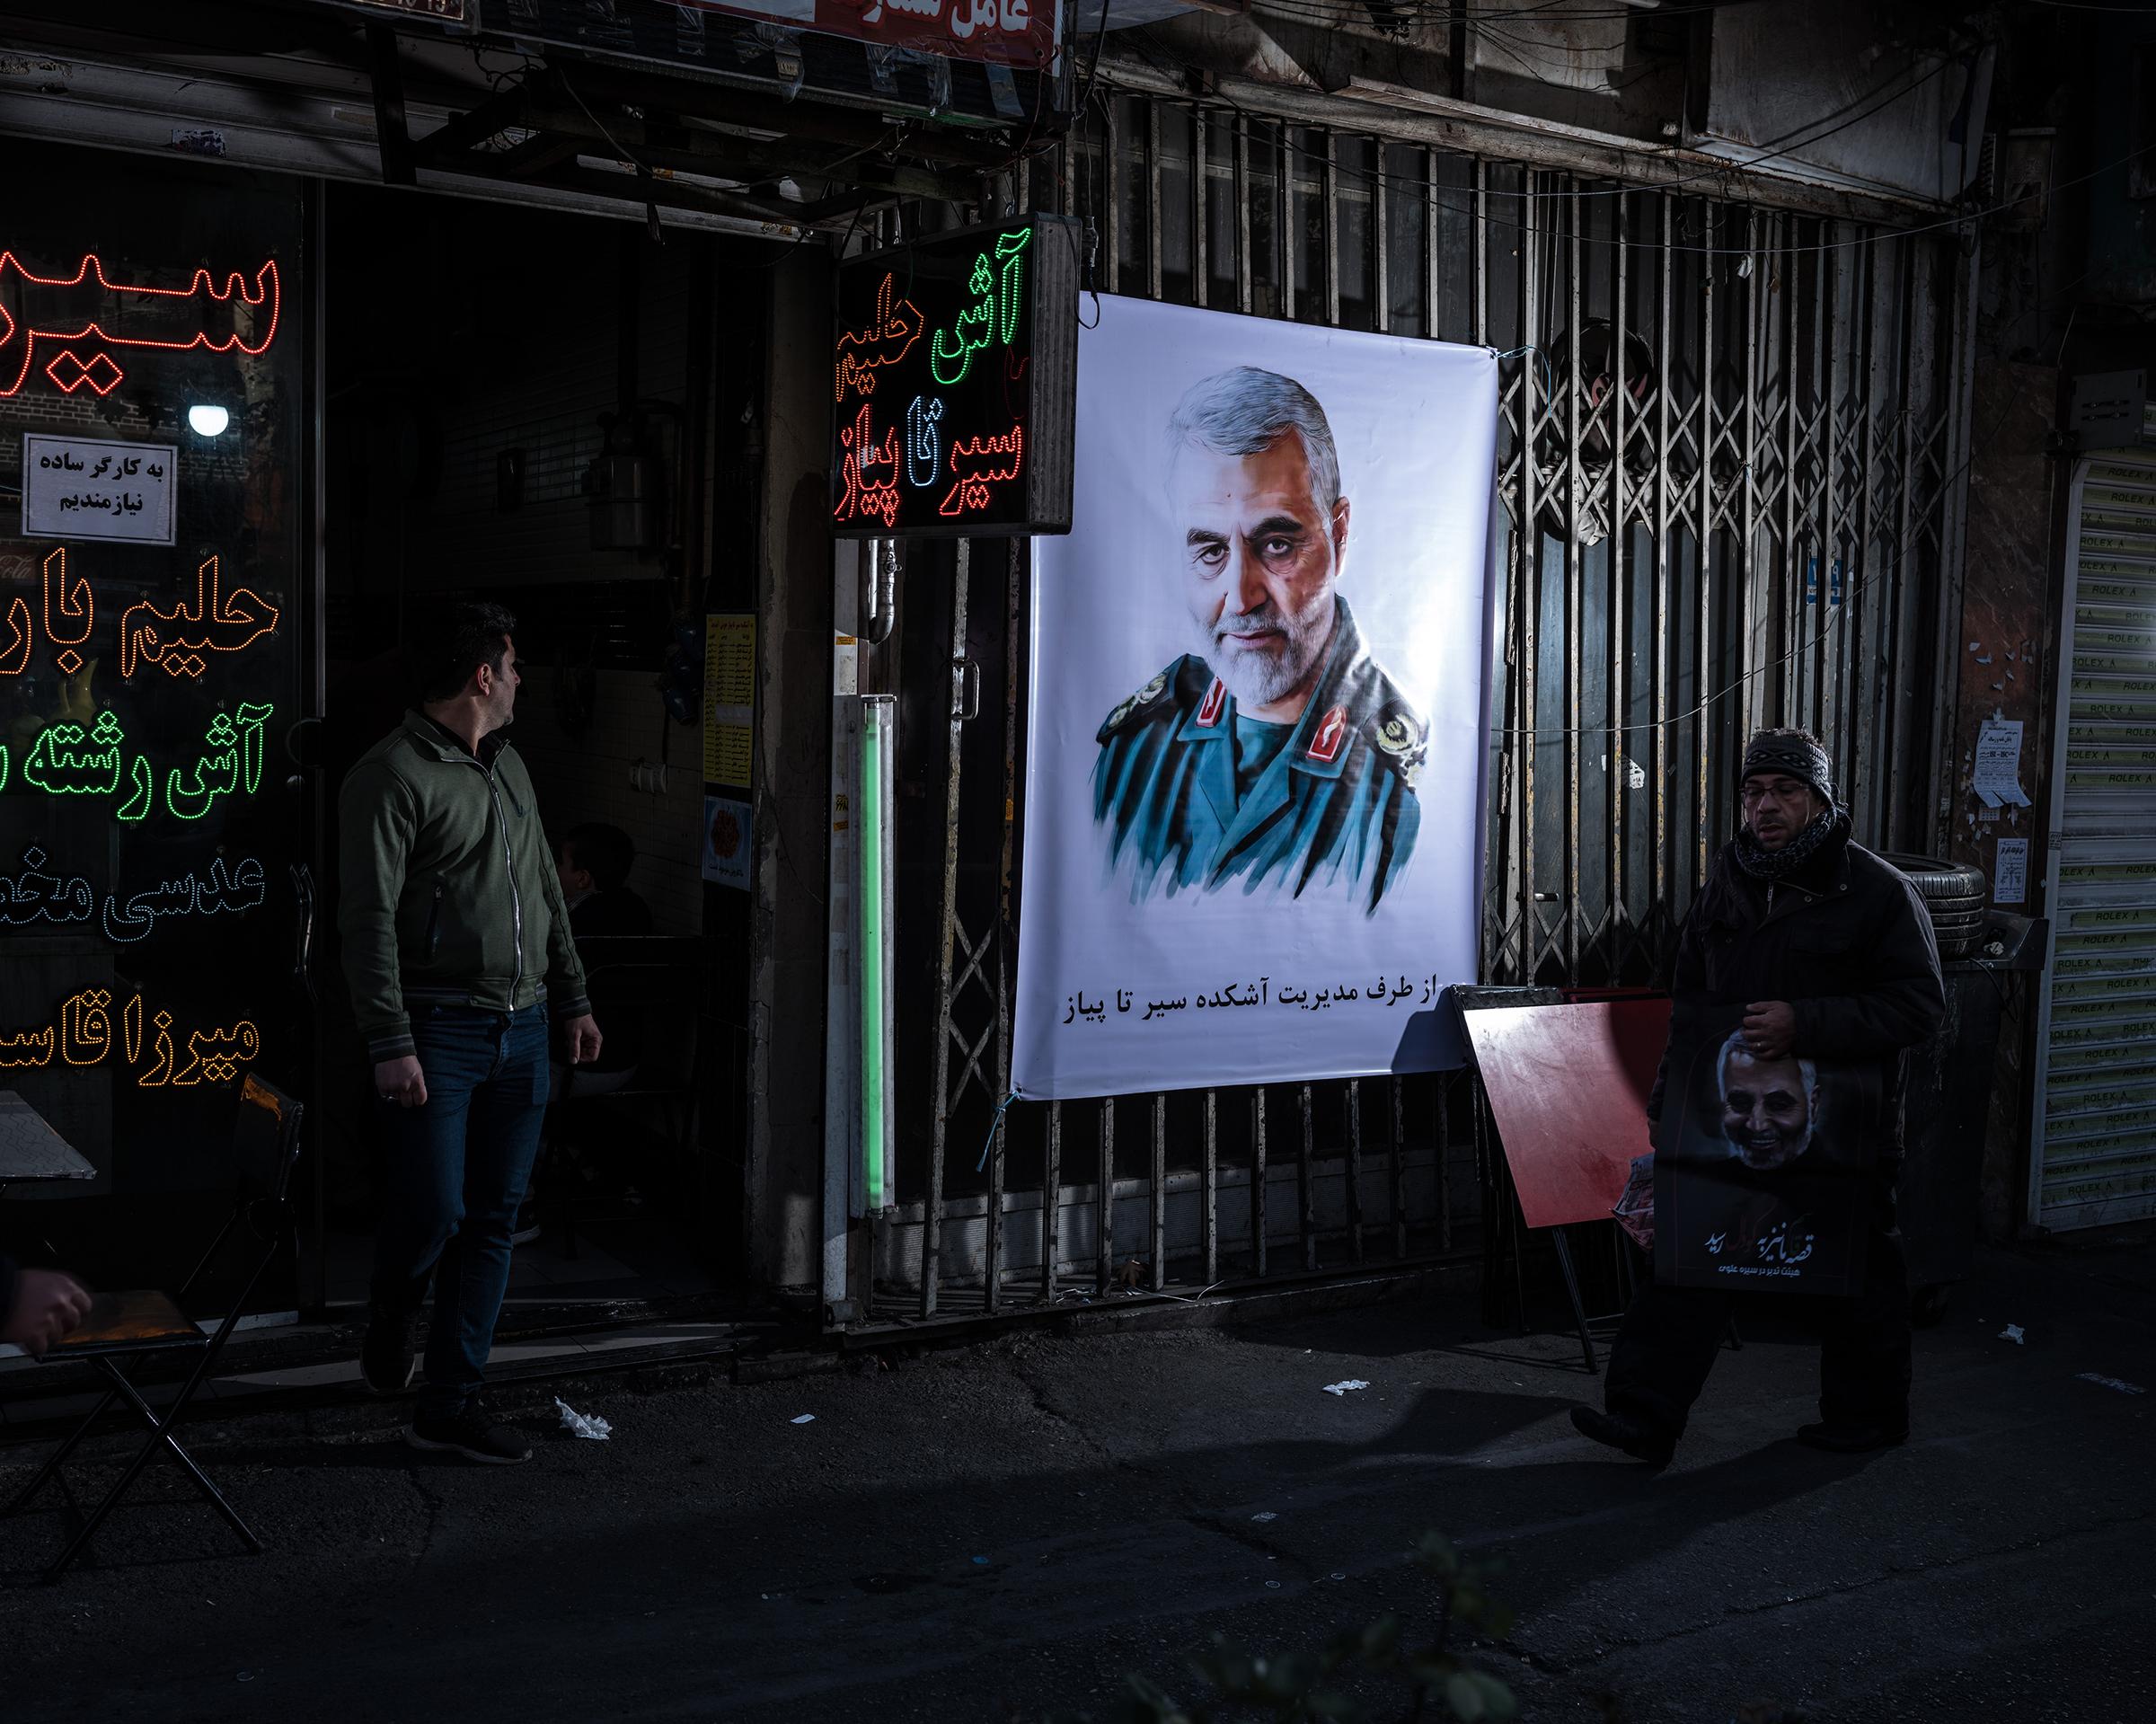 A poster of Qasem Soleimani on a street in Tehran on Jan. 6.